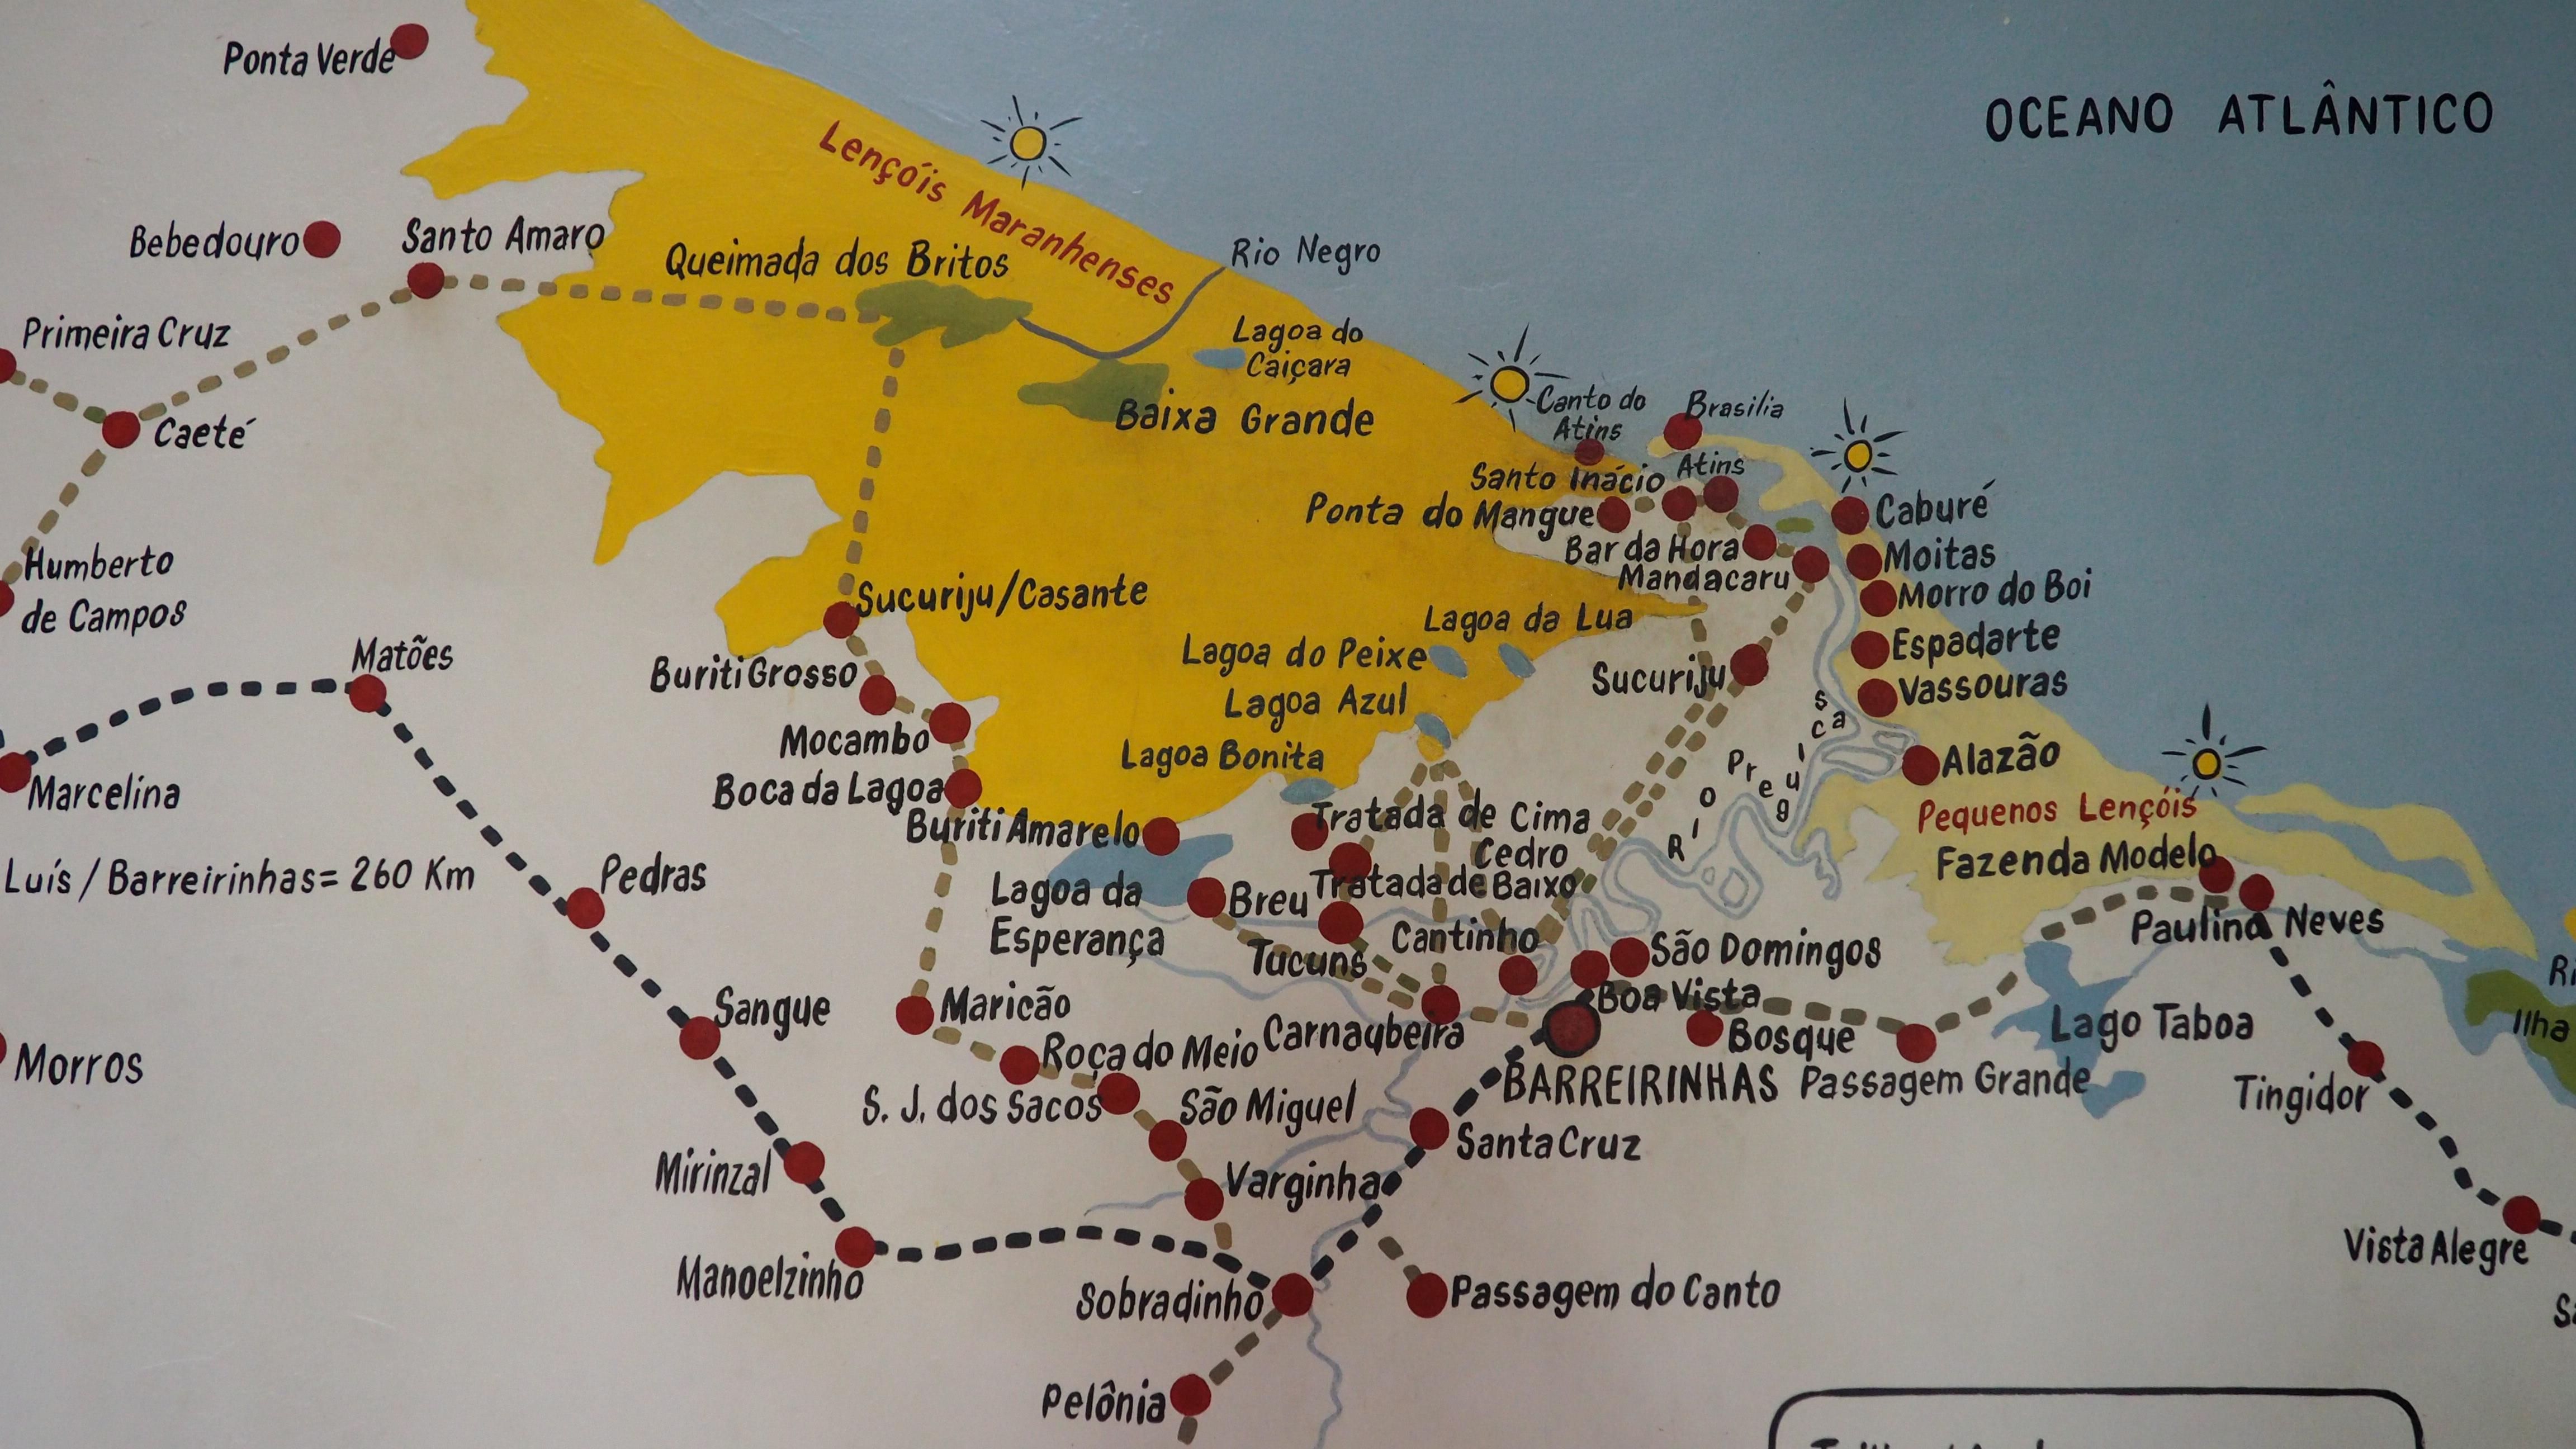 Mapa de los Lençois Maranhenses